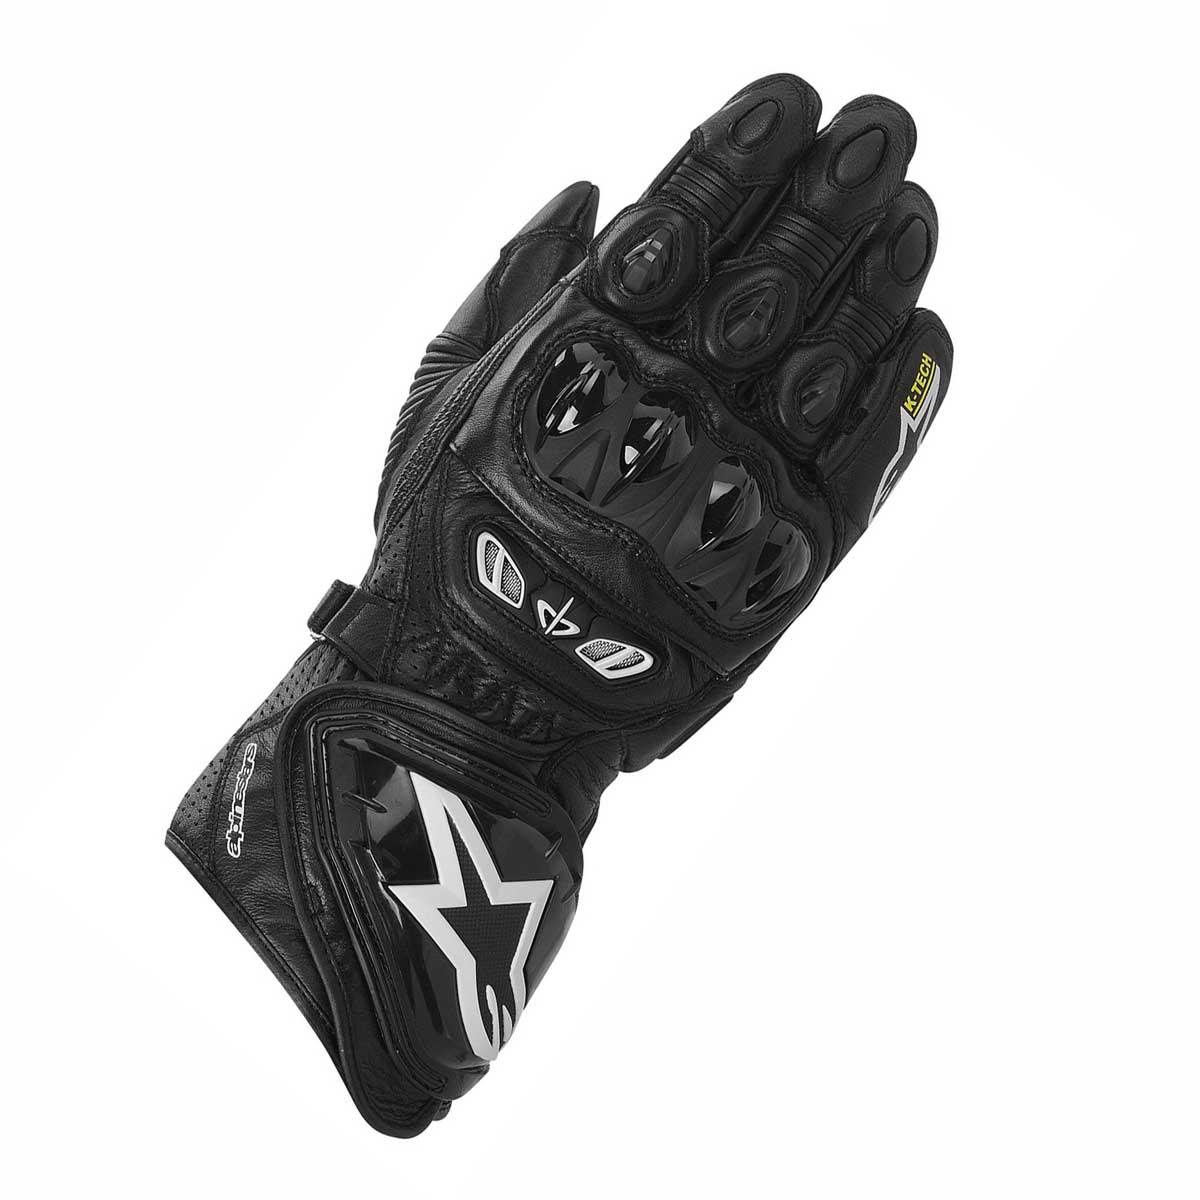 The Alpinestars GP Tech Summer Gloves